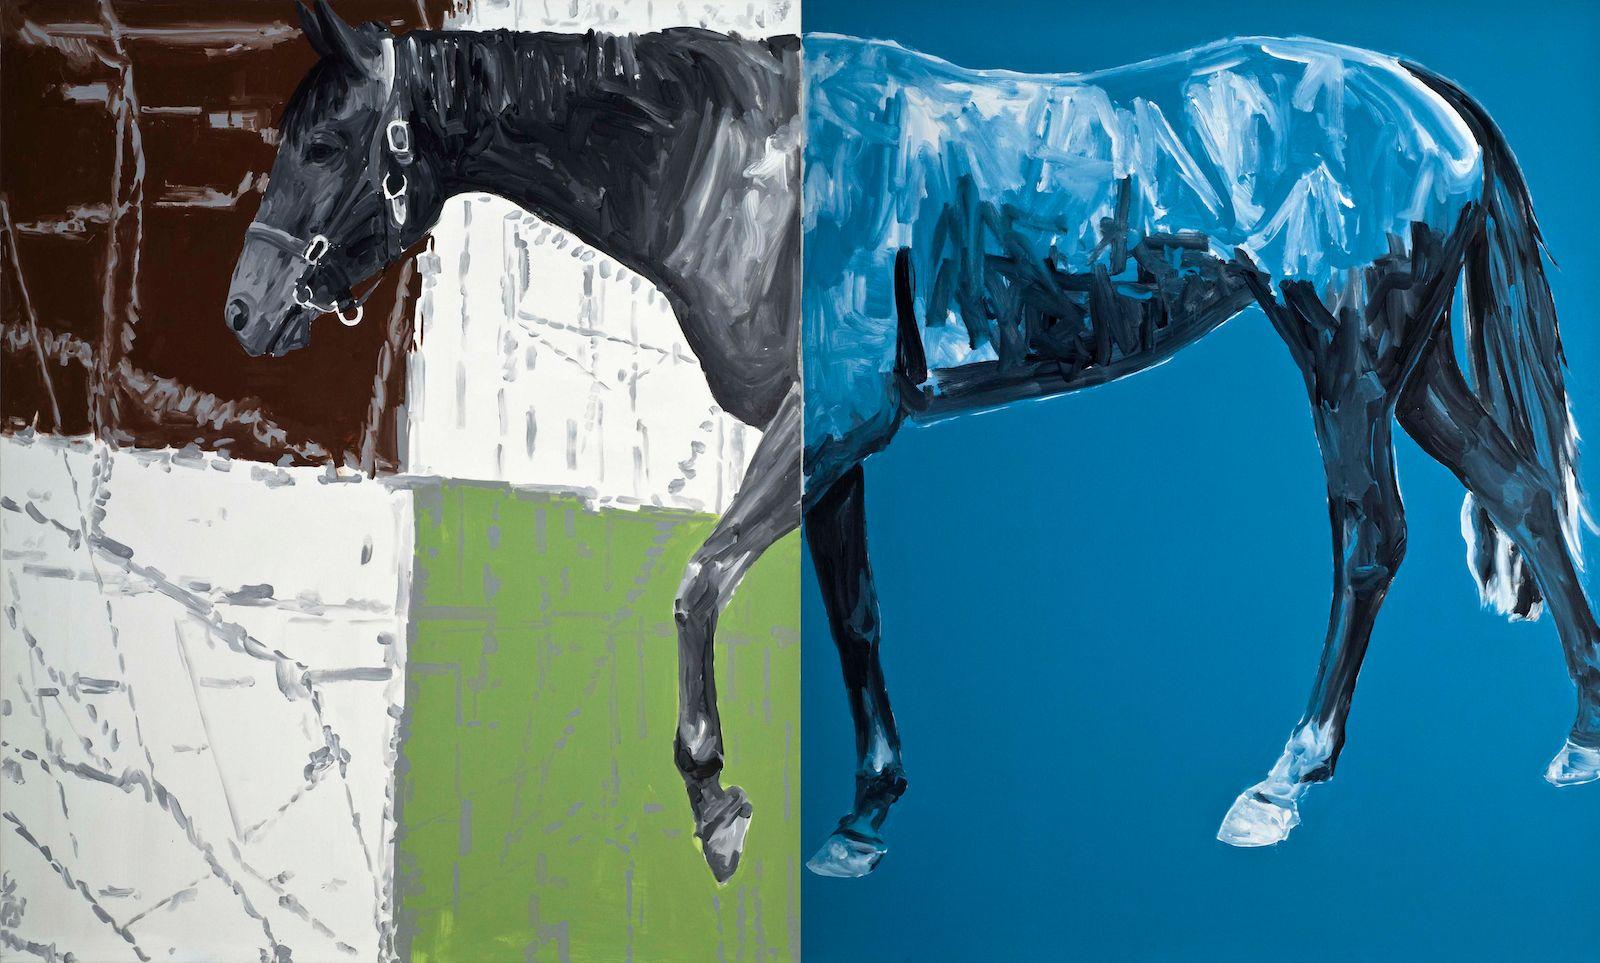 Untitled, 2008, acrylic on canvas, 180 x 300 cm